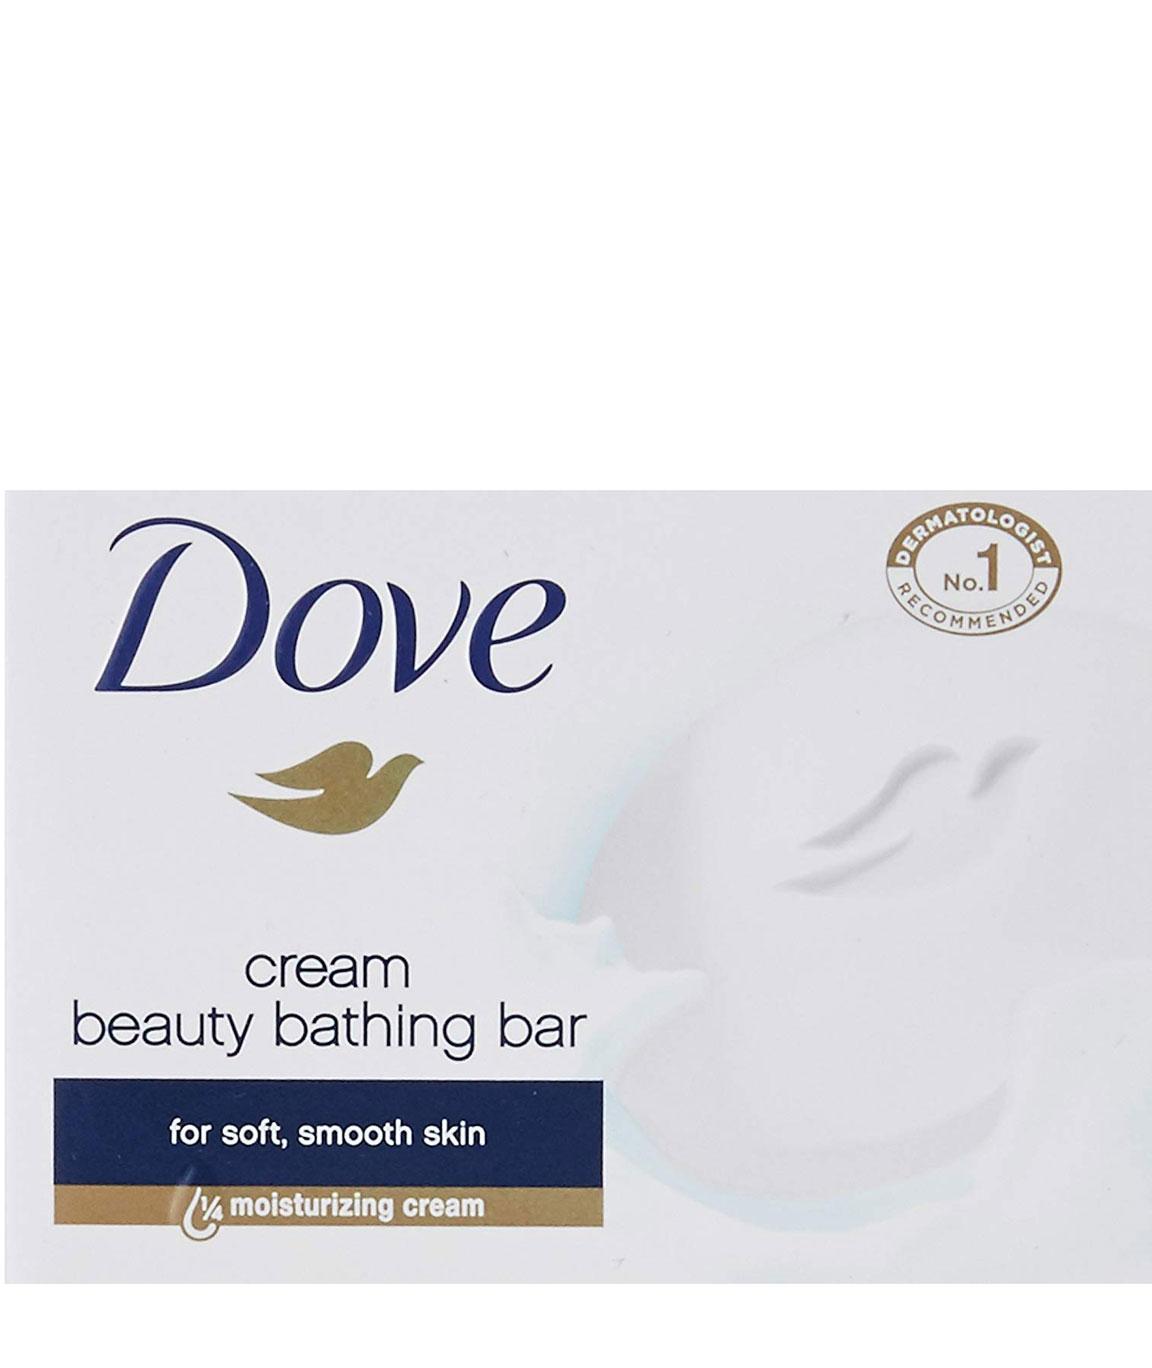 Dove Cream Beauty Bathing Bar 100g (Buy 4 Get 1 Free)